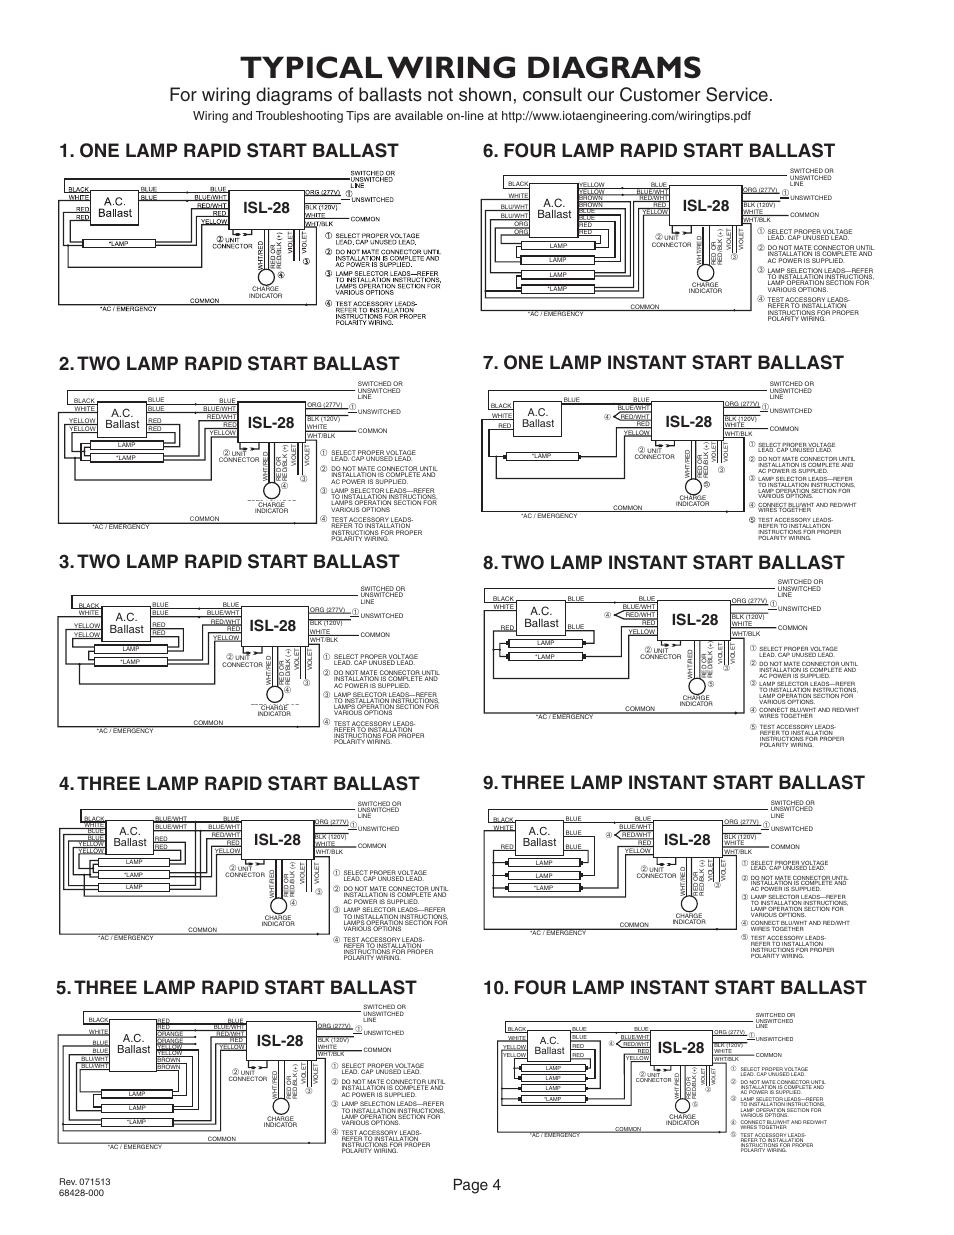 iota isl 28 page4?resize=840%2C1087 iota emergency ballast wiring diagram periodic & diagrams science iota isl 540 wiring diagram at readyjetset.co